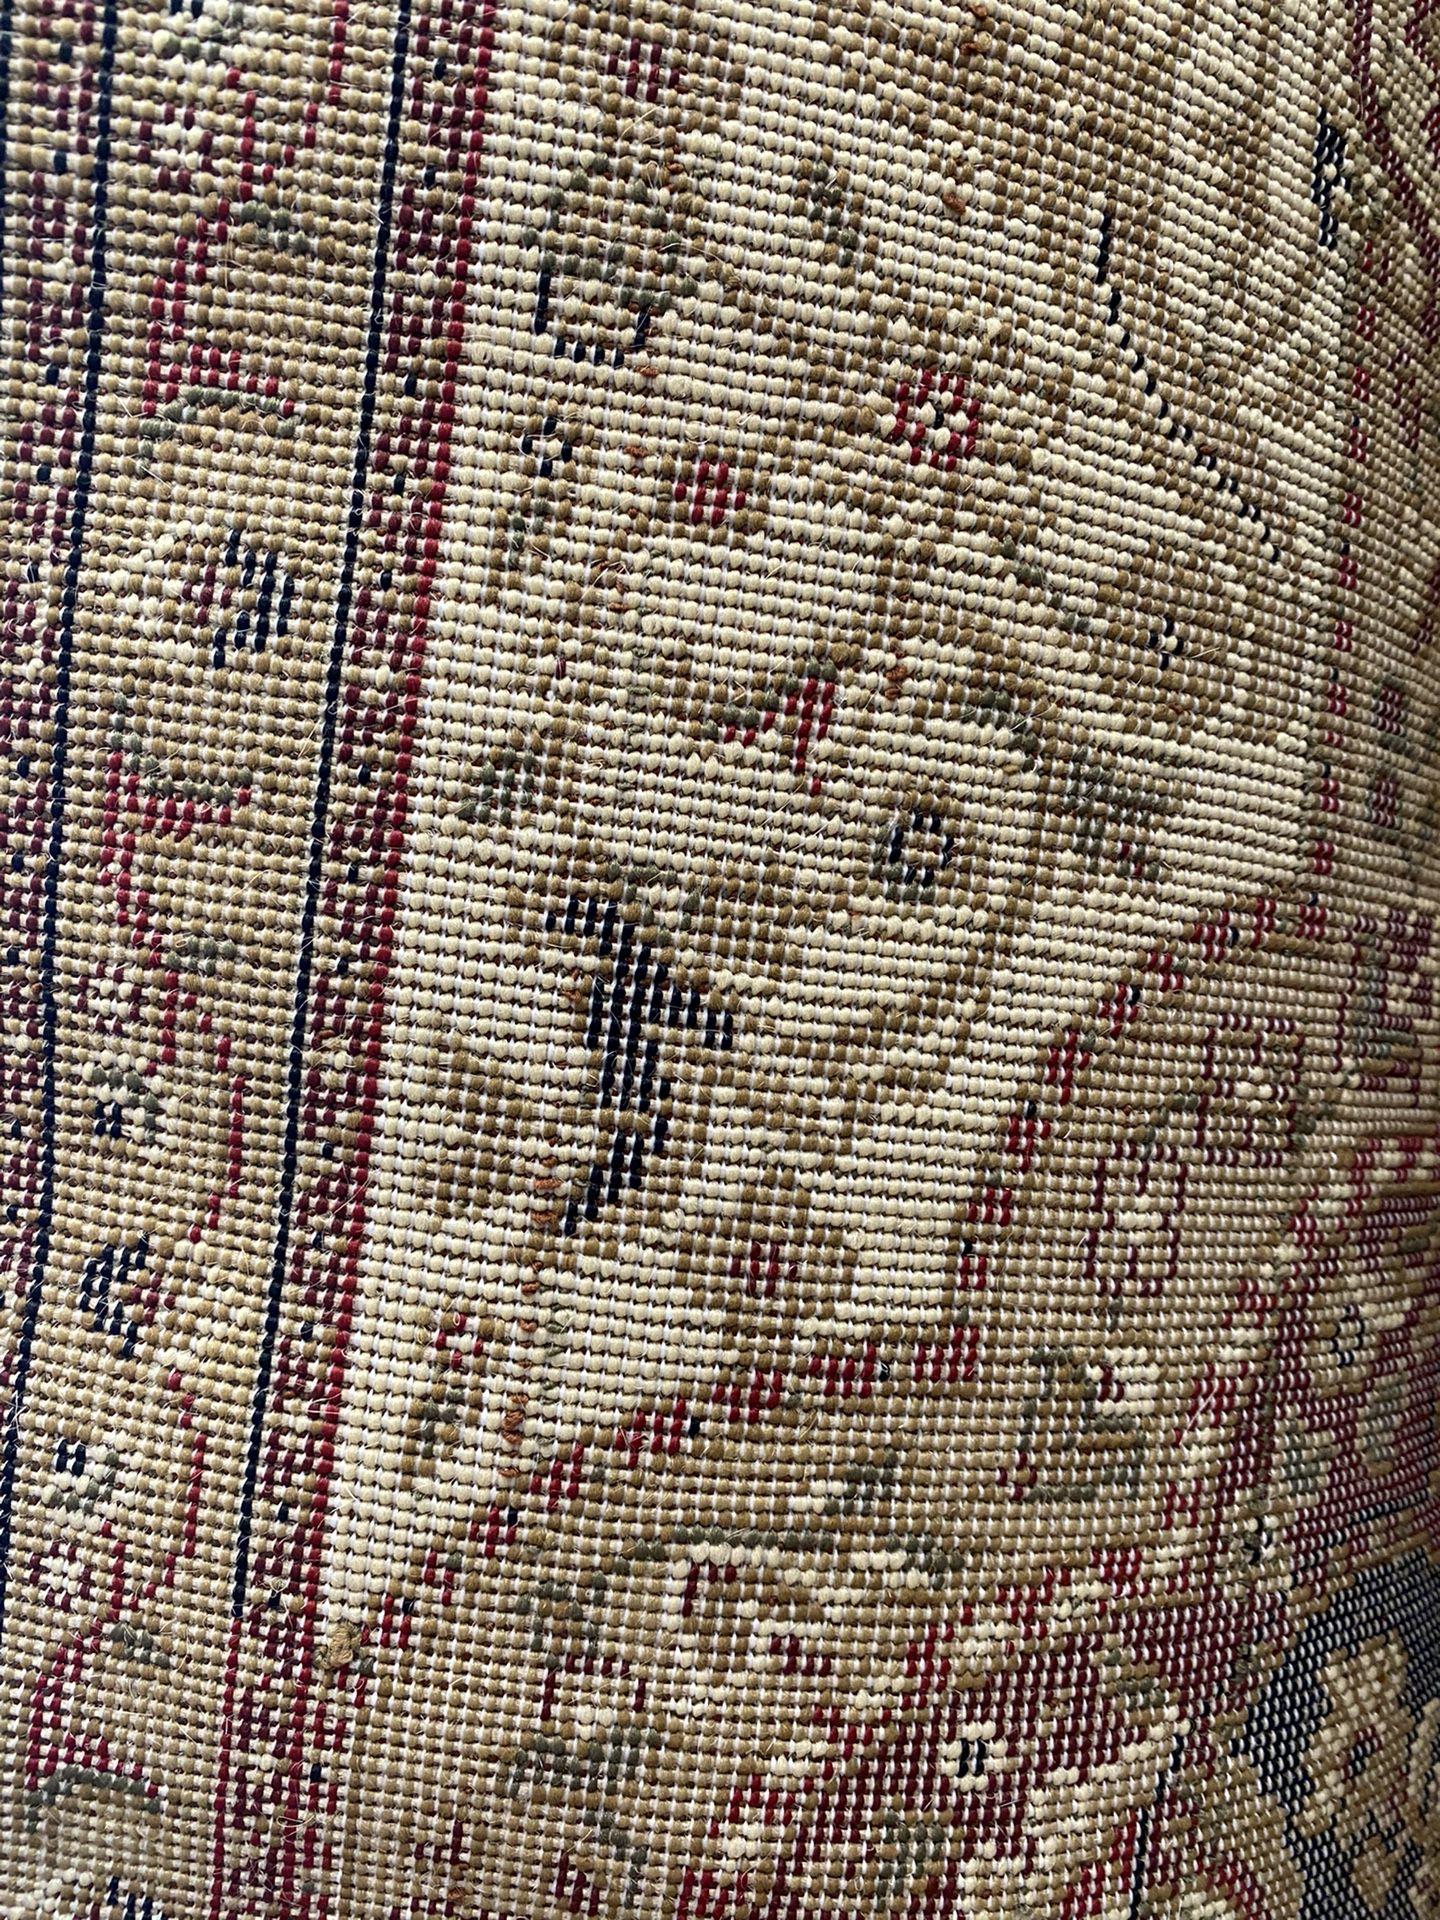 5/7 black red beige color classic design Persian medallion style carpet.